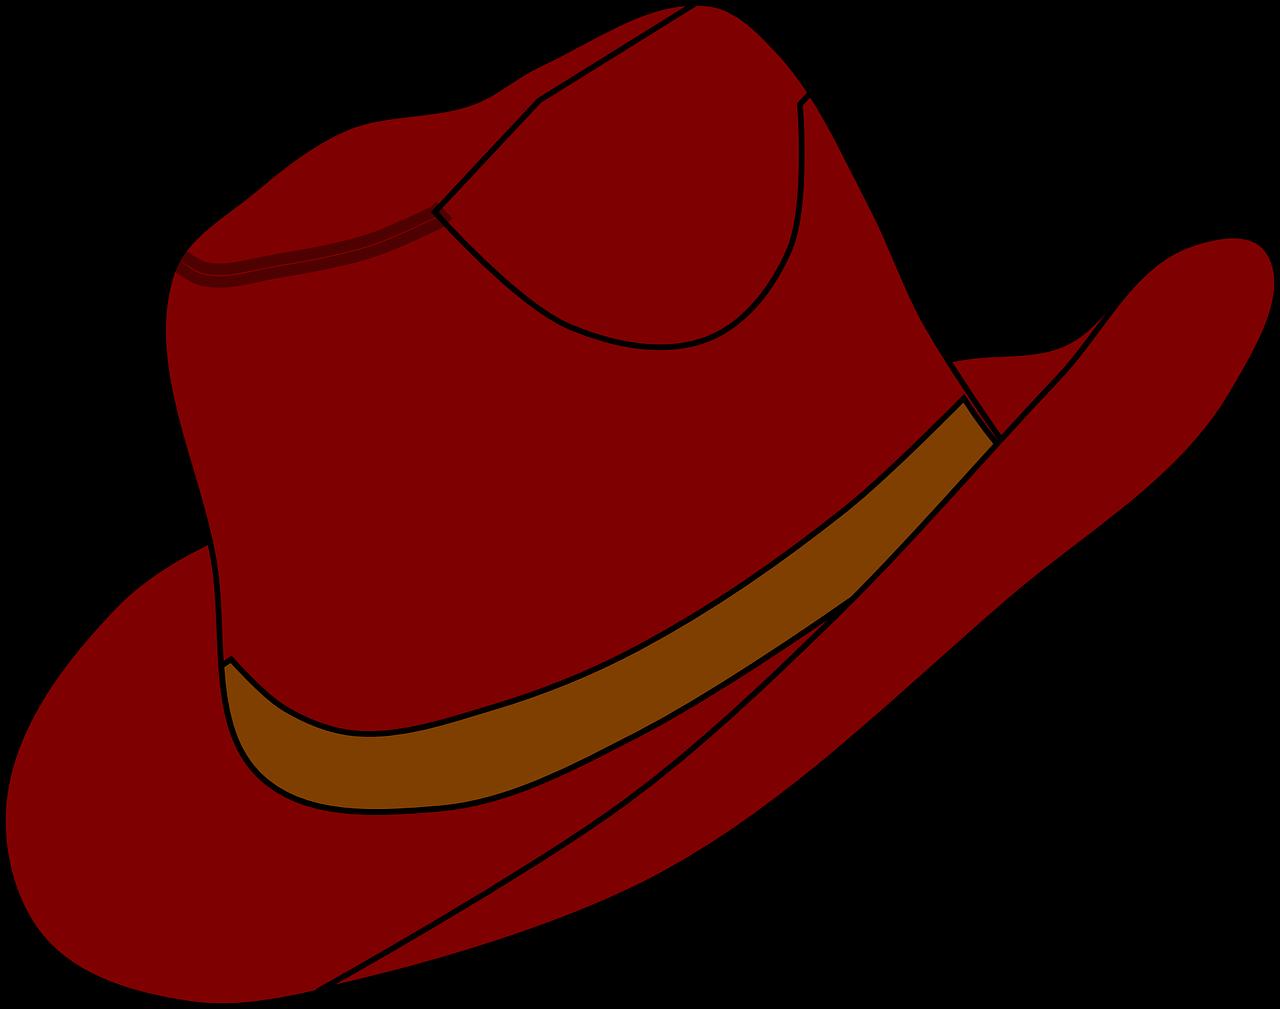 1280x1009 Cowboy Hat Clipart Free Danaspaj Top